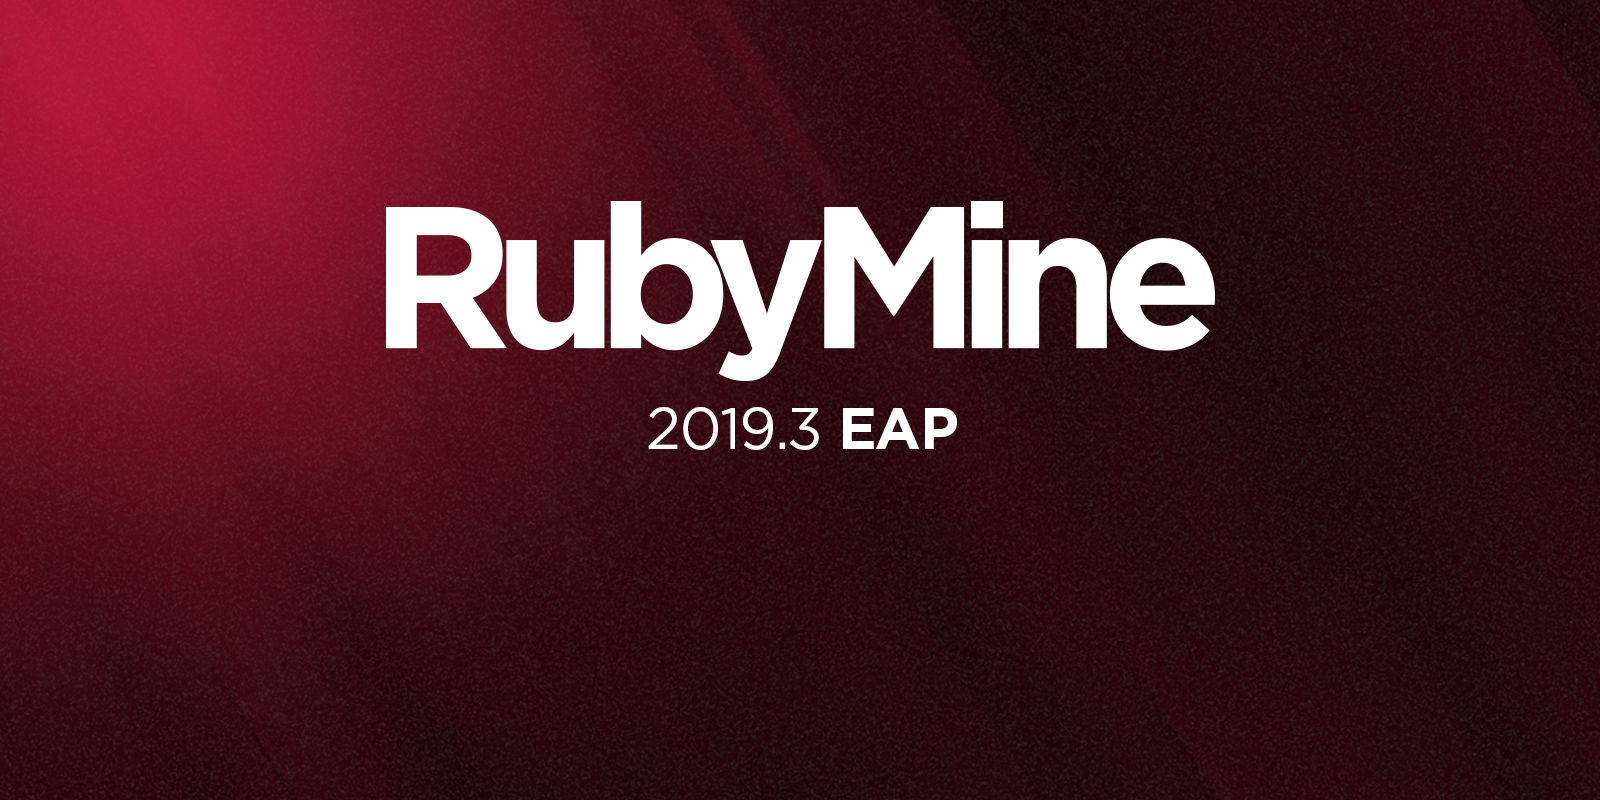 RubyMine 2019.3 EAP